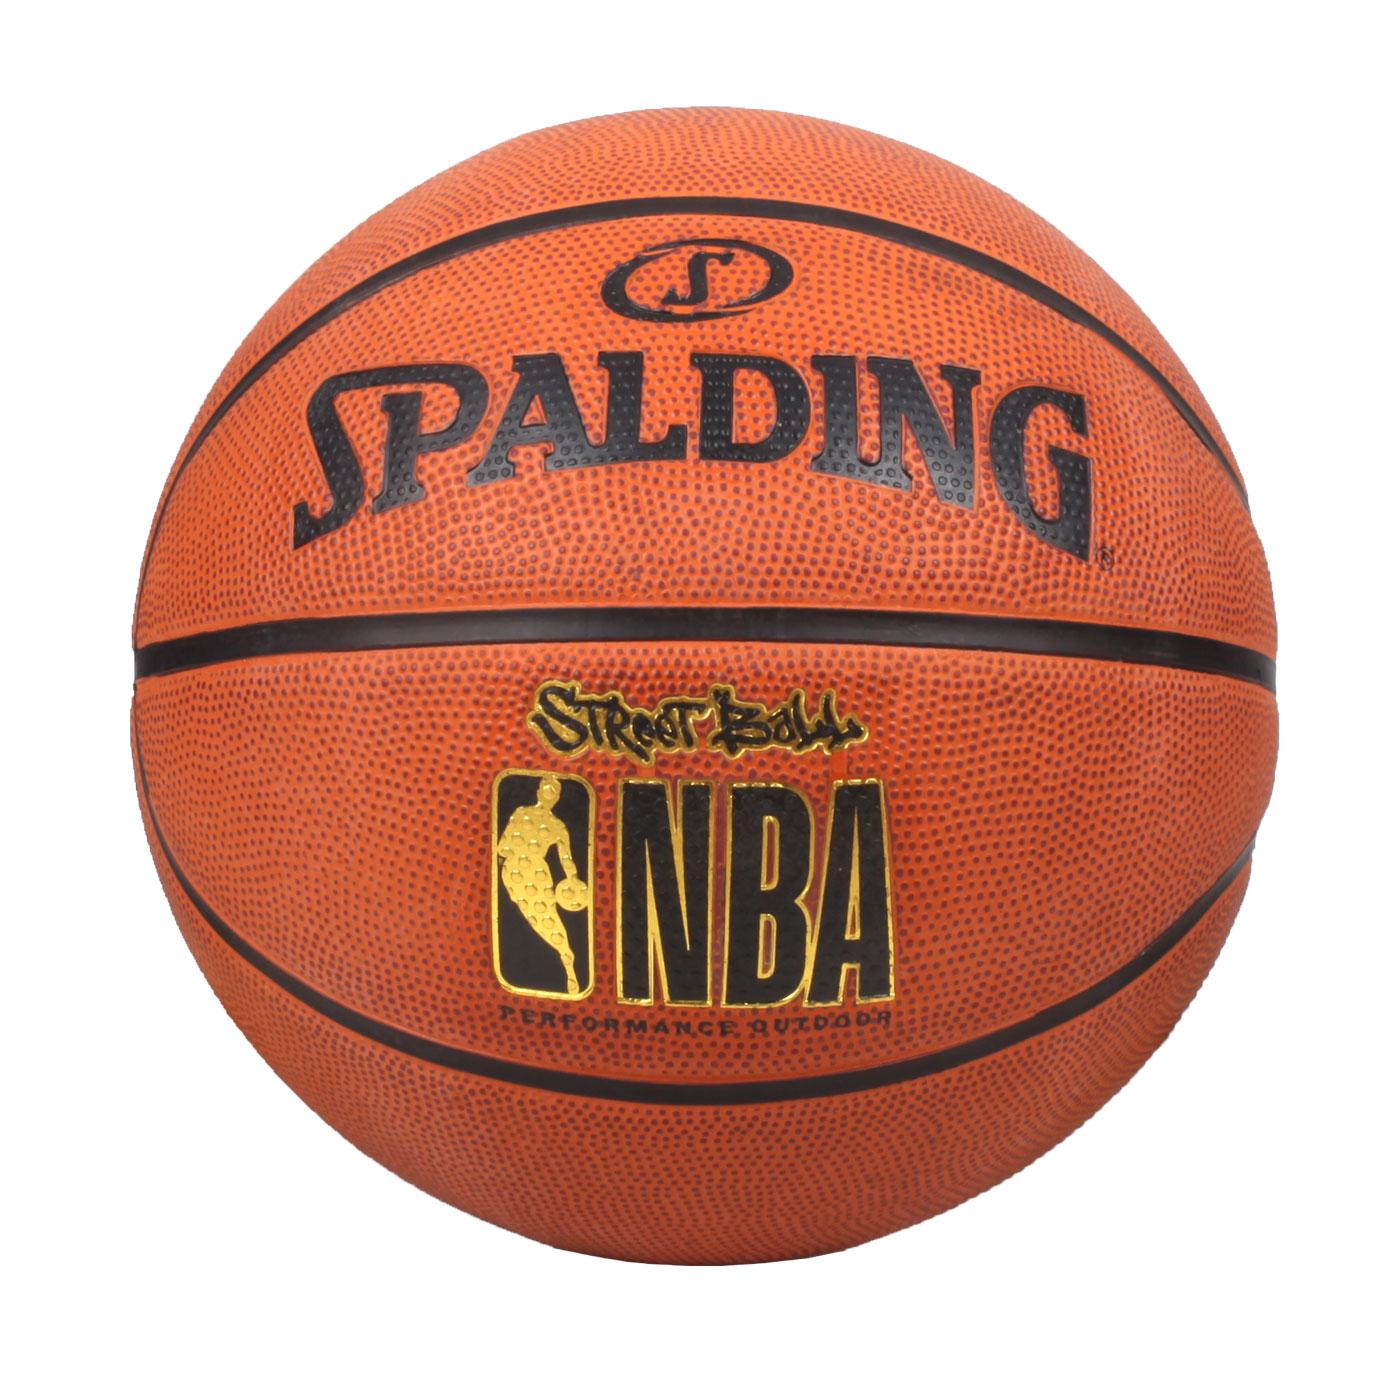 SPALDING Street Rubber 籃球 #7 SPA73799 - 暗橘黑金